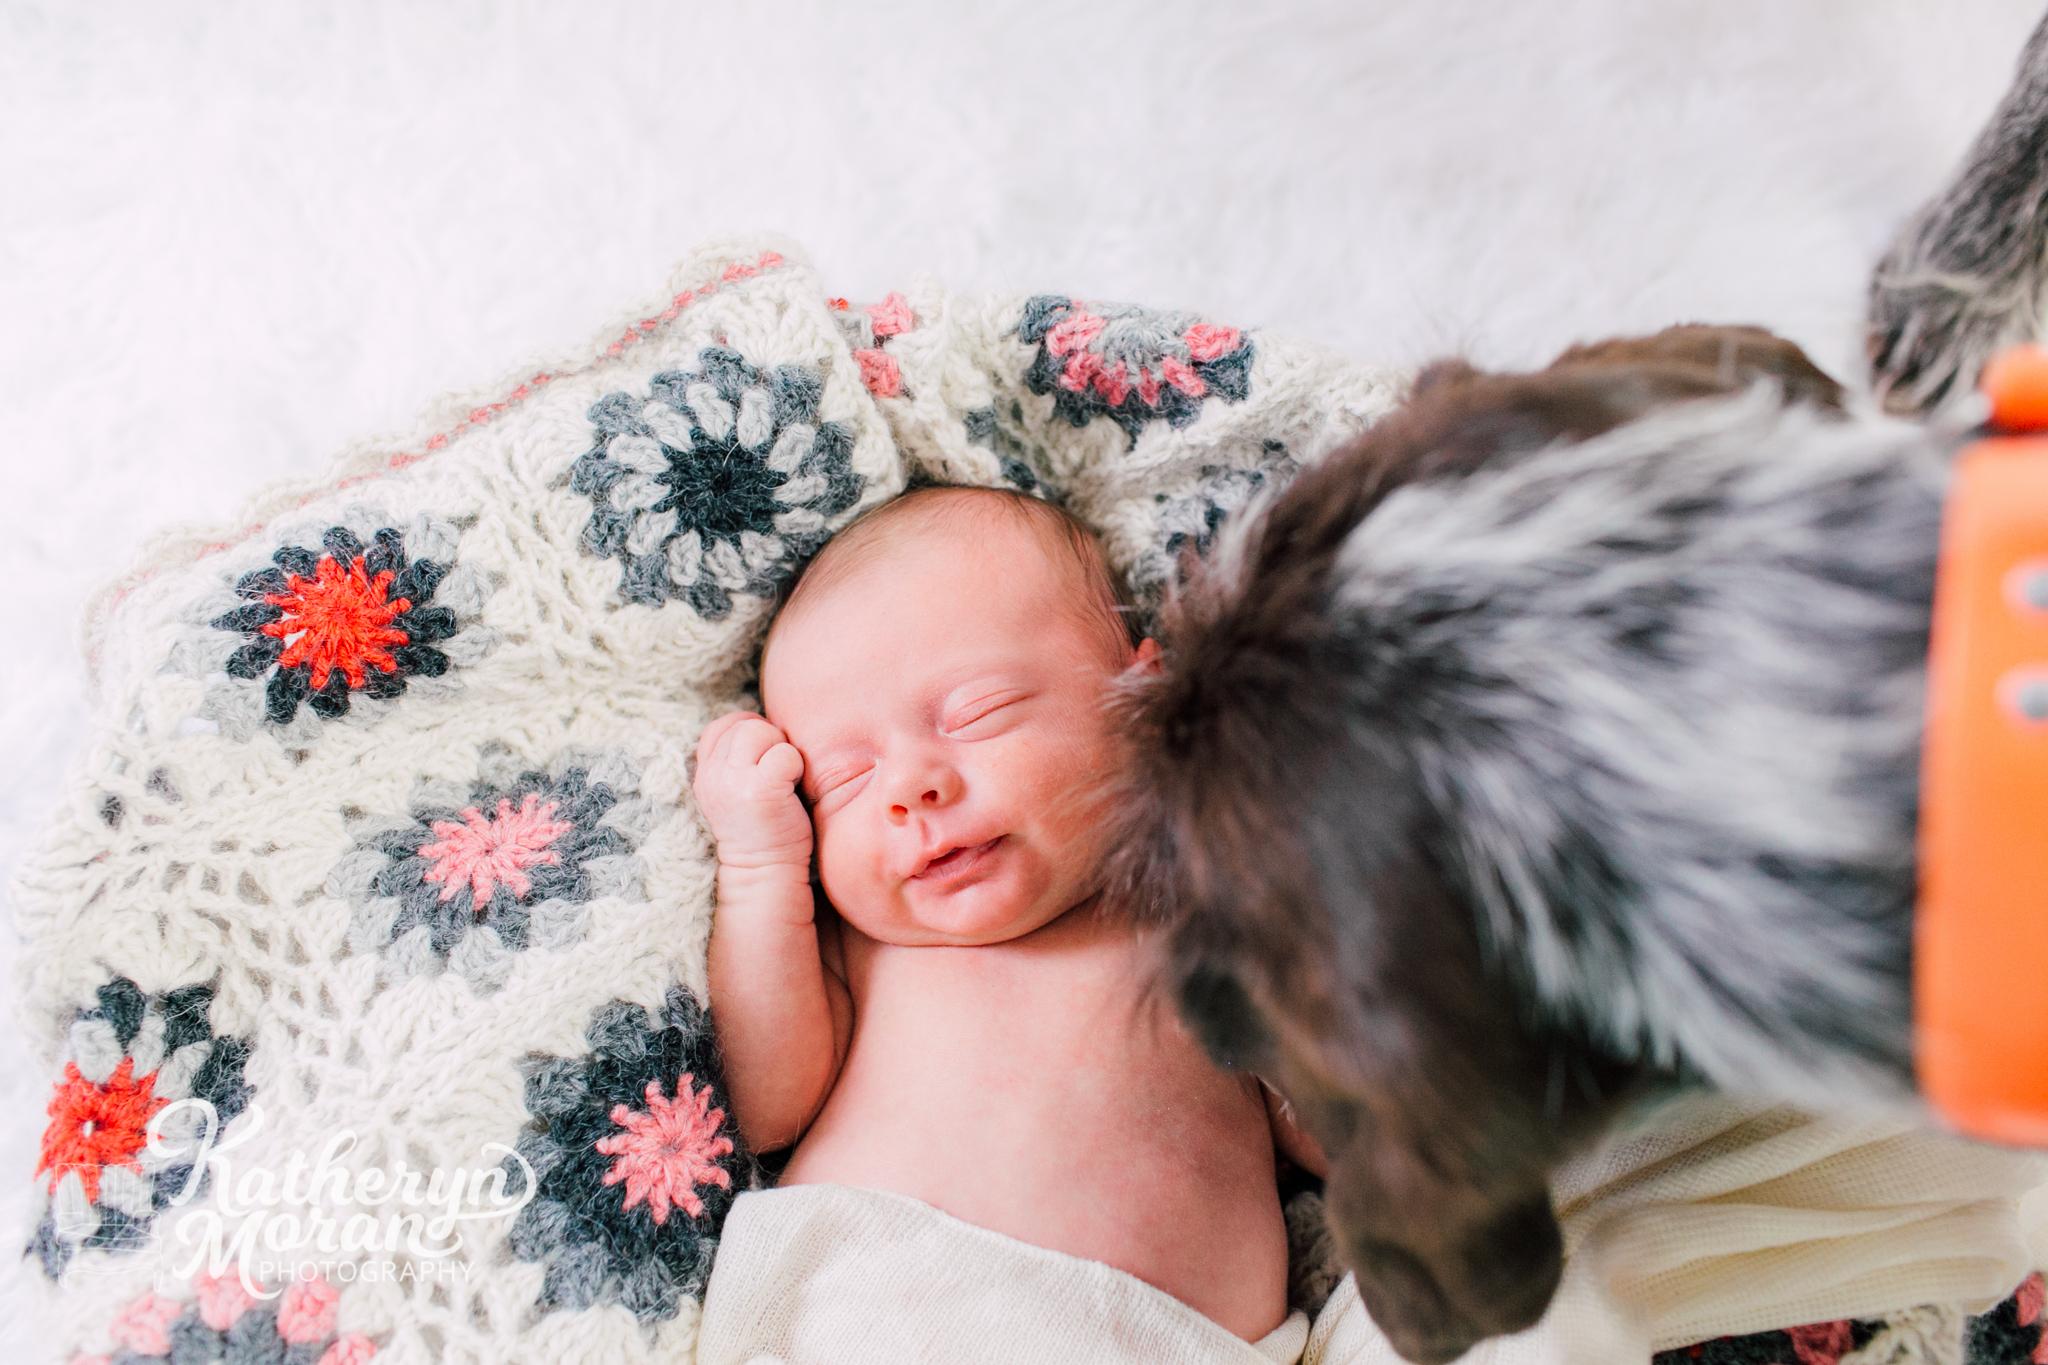 seattle-newborn-photographer-katheryn-moran-avery-malaspino-10-2.jpg